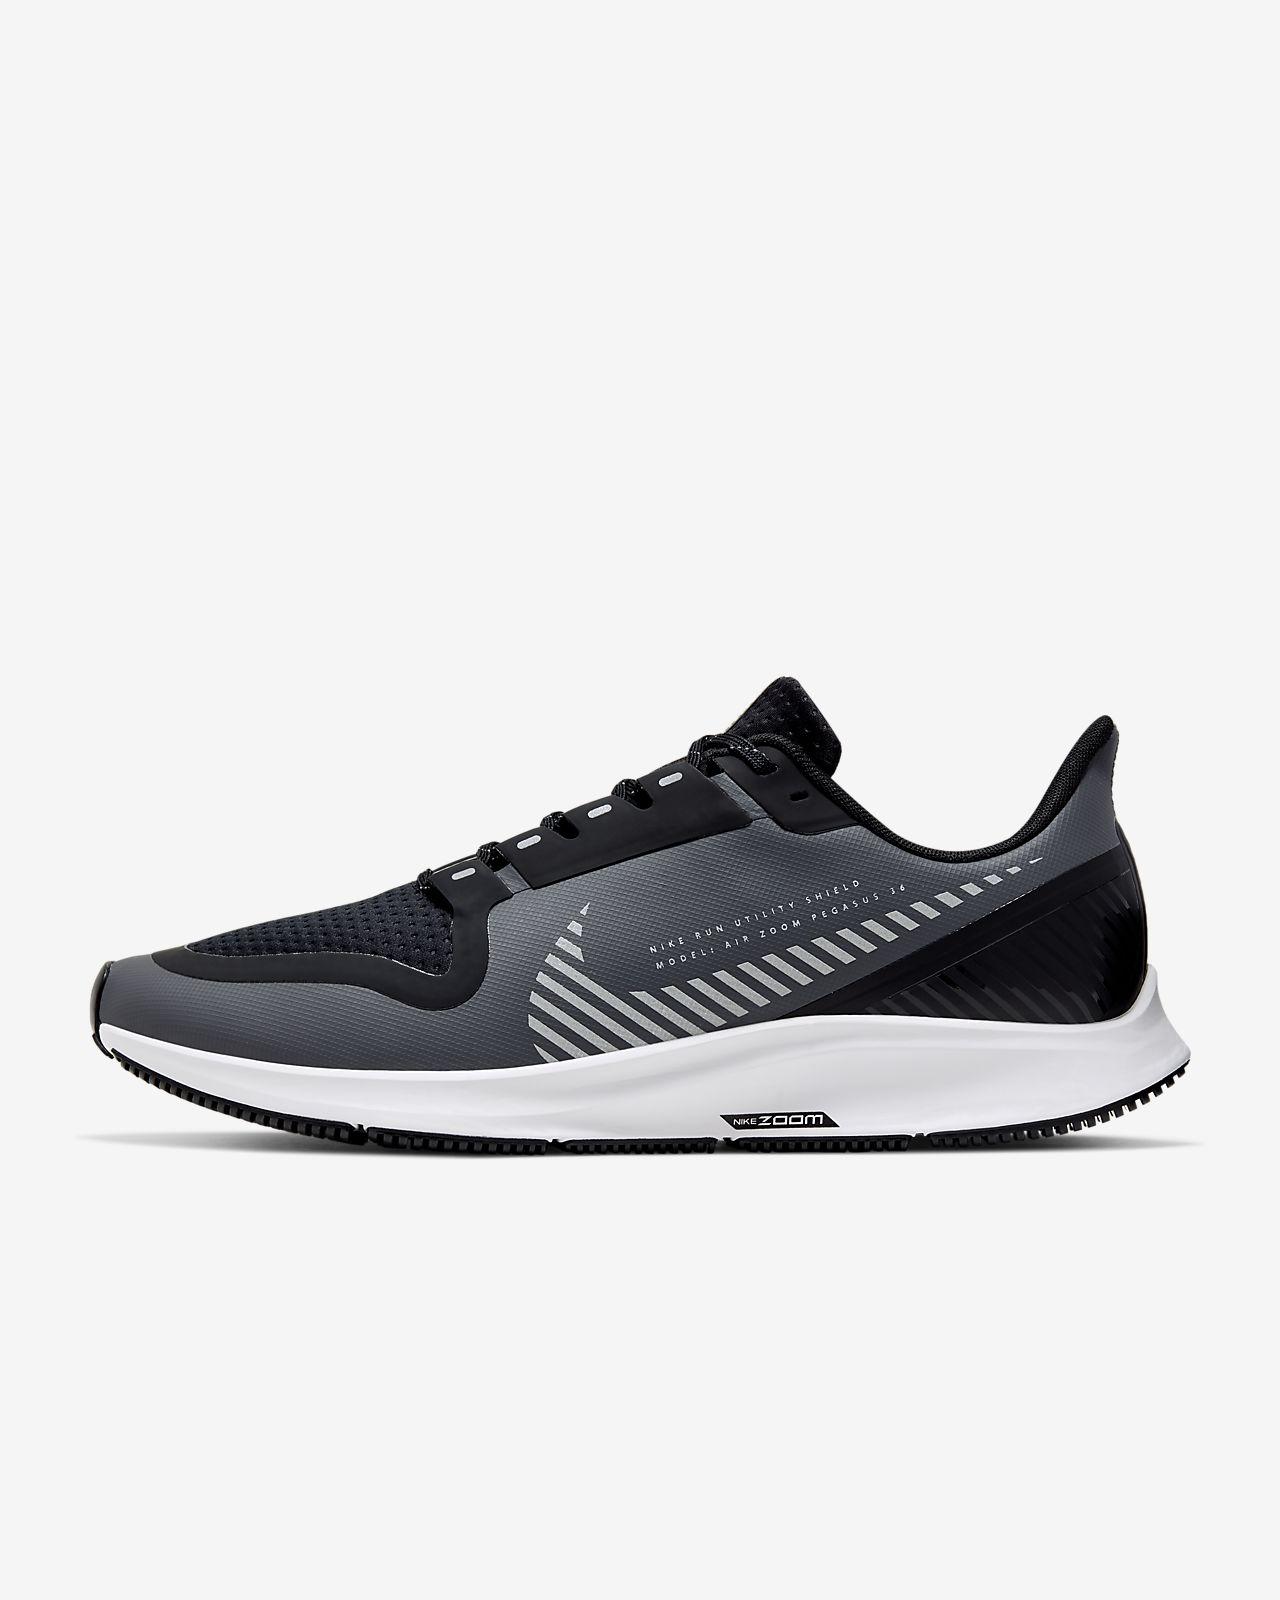 Chaussure de running Nike Air Zoom Pegasus 36 Shield pour Homme